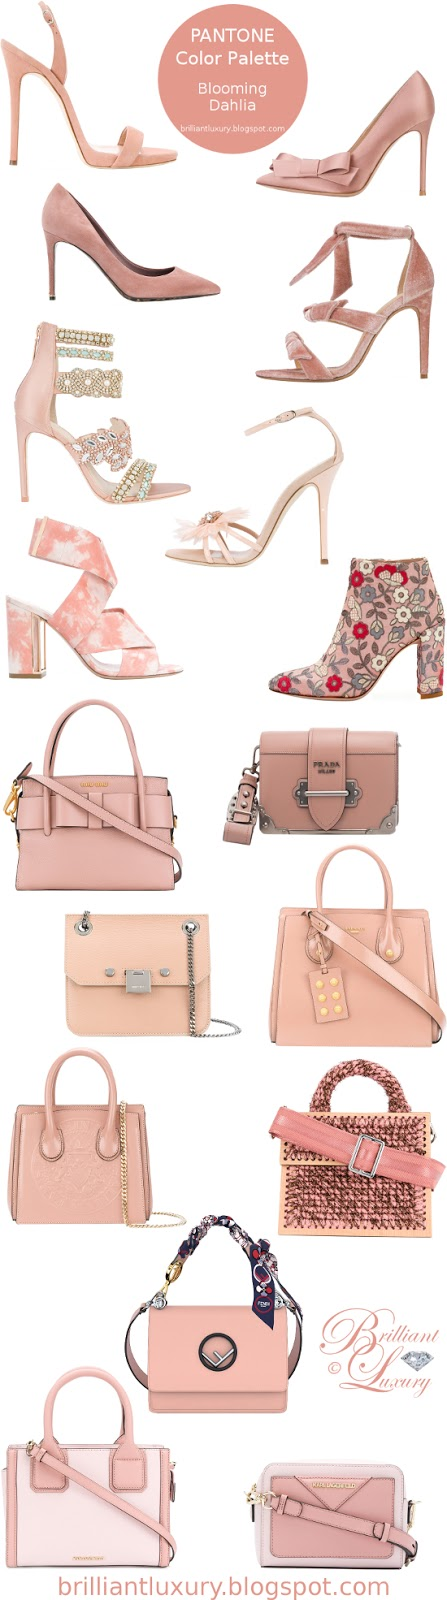 Brilliant Luxury ♦ Pantone Fashion Color ~ blooming dahlia